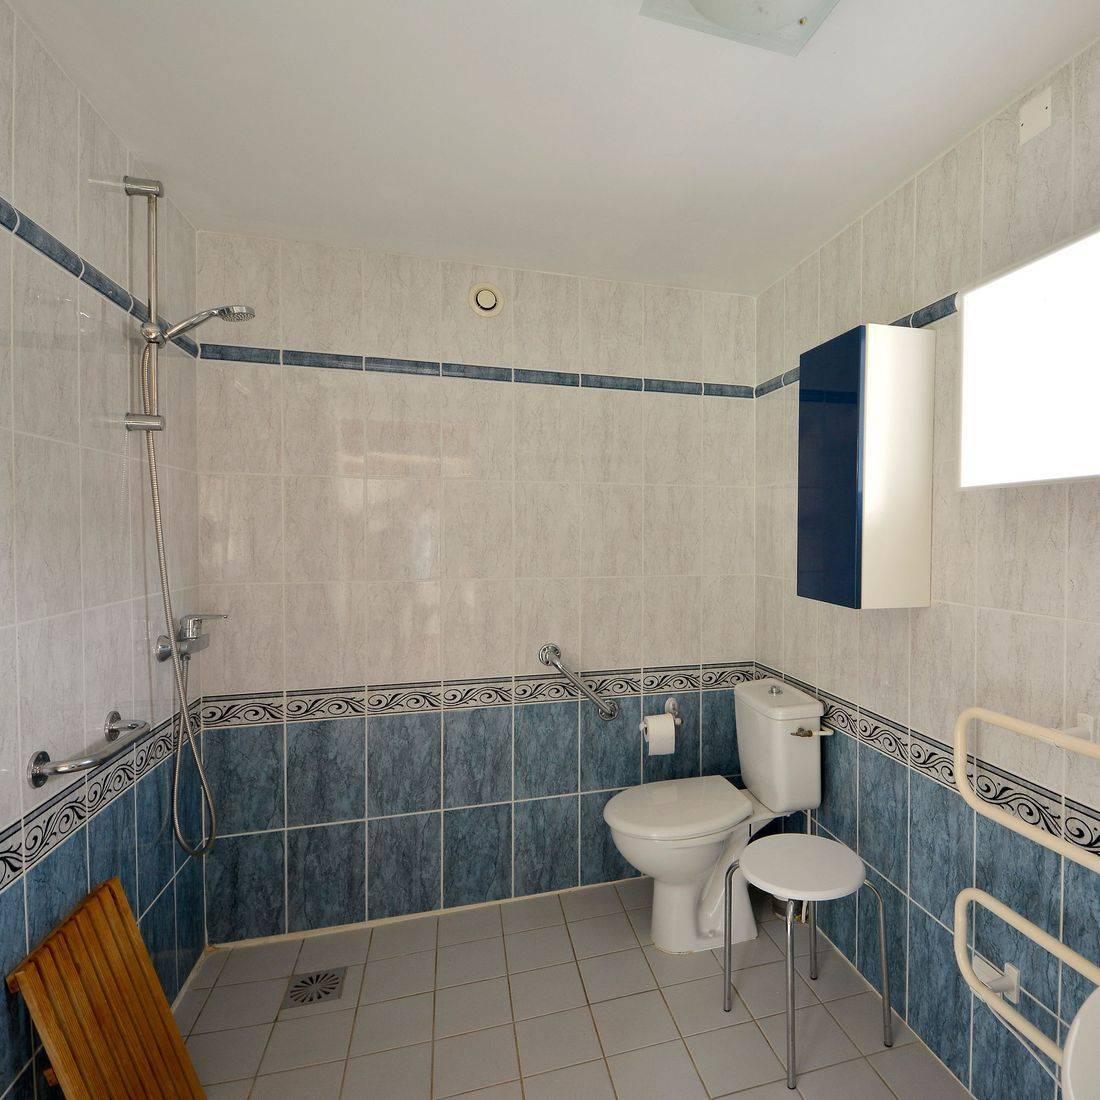 La Chouette wet room